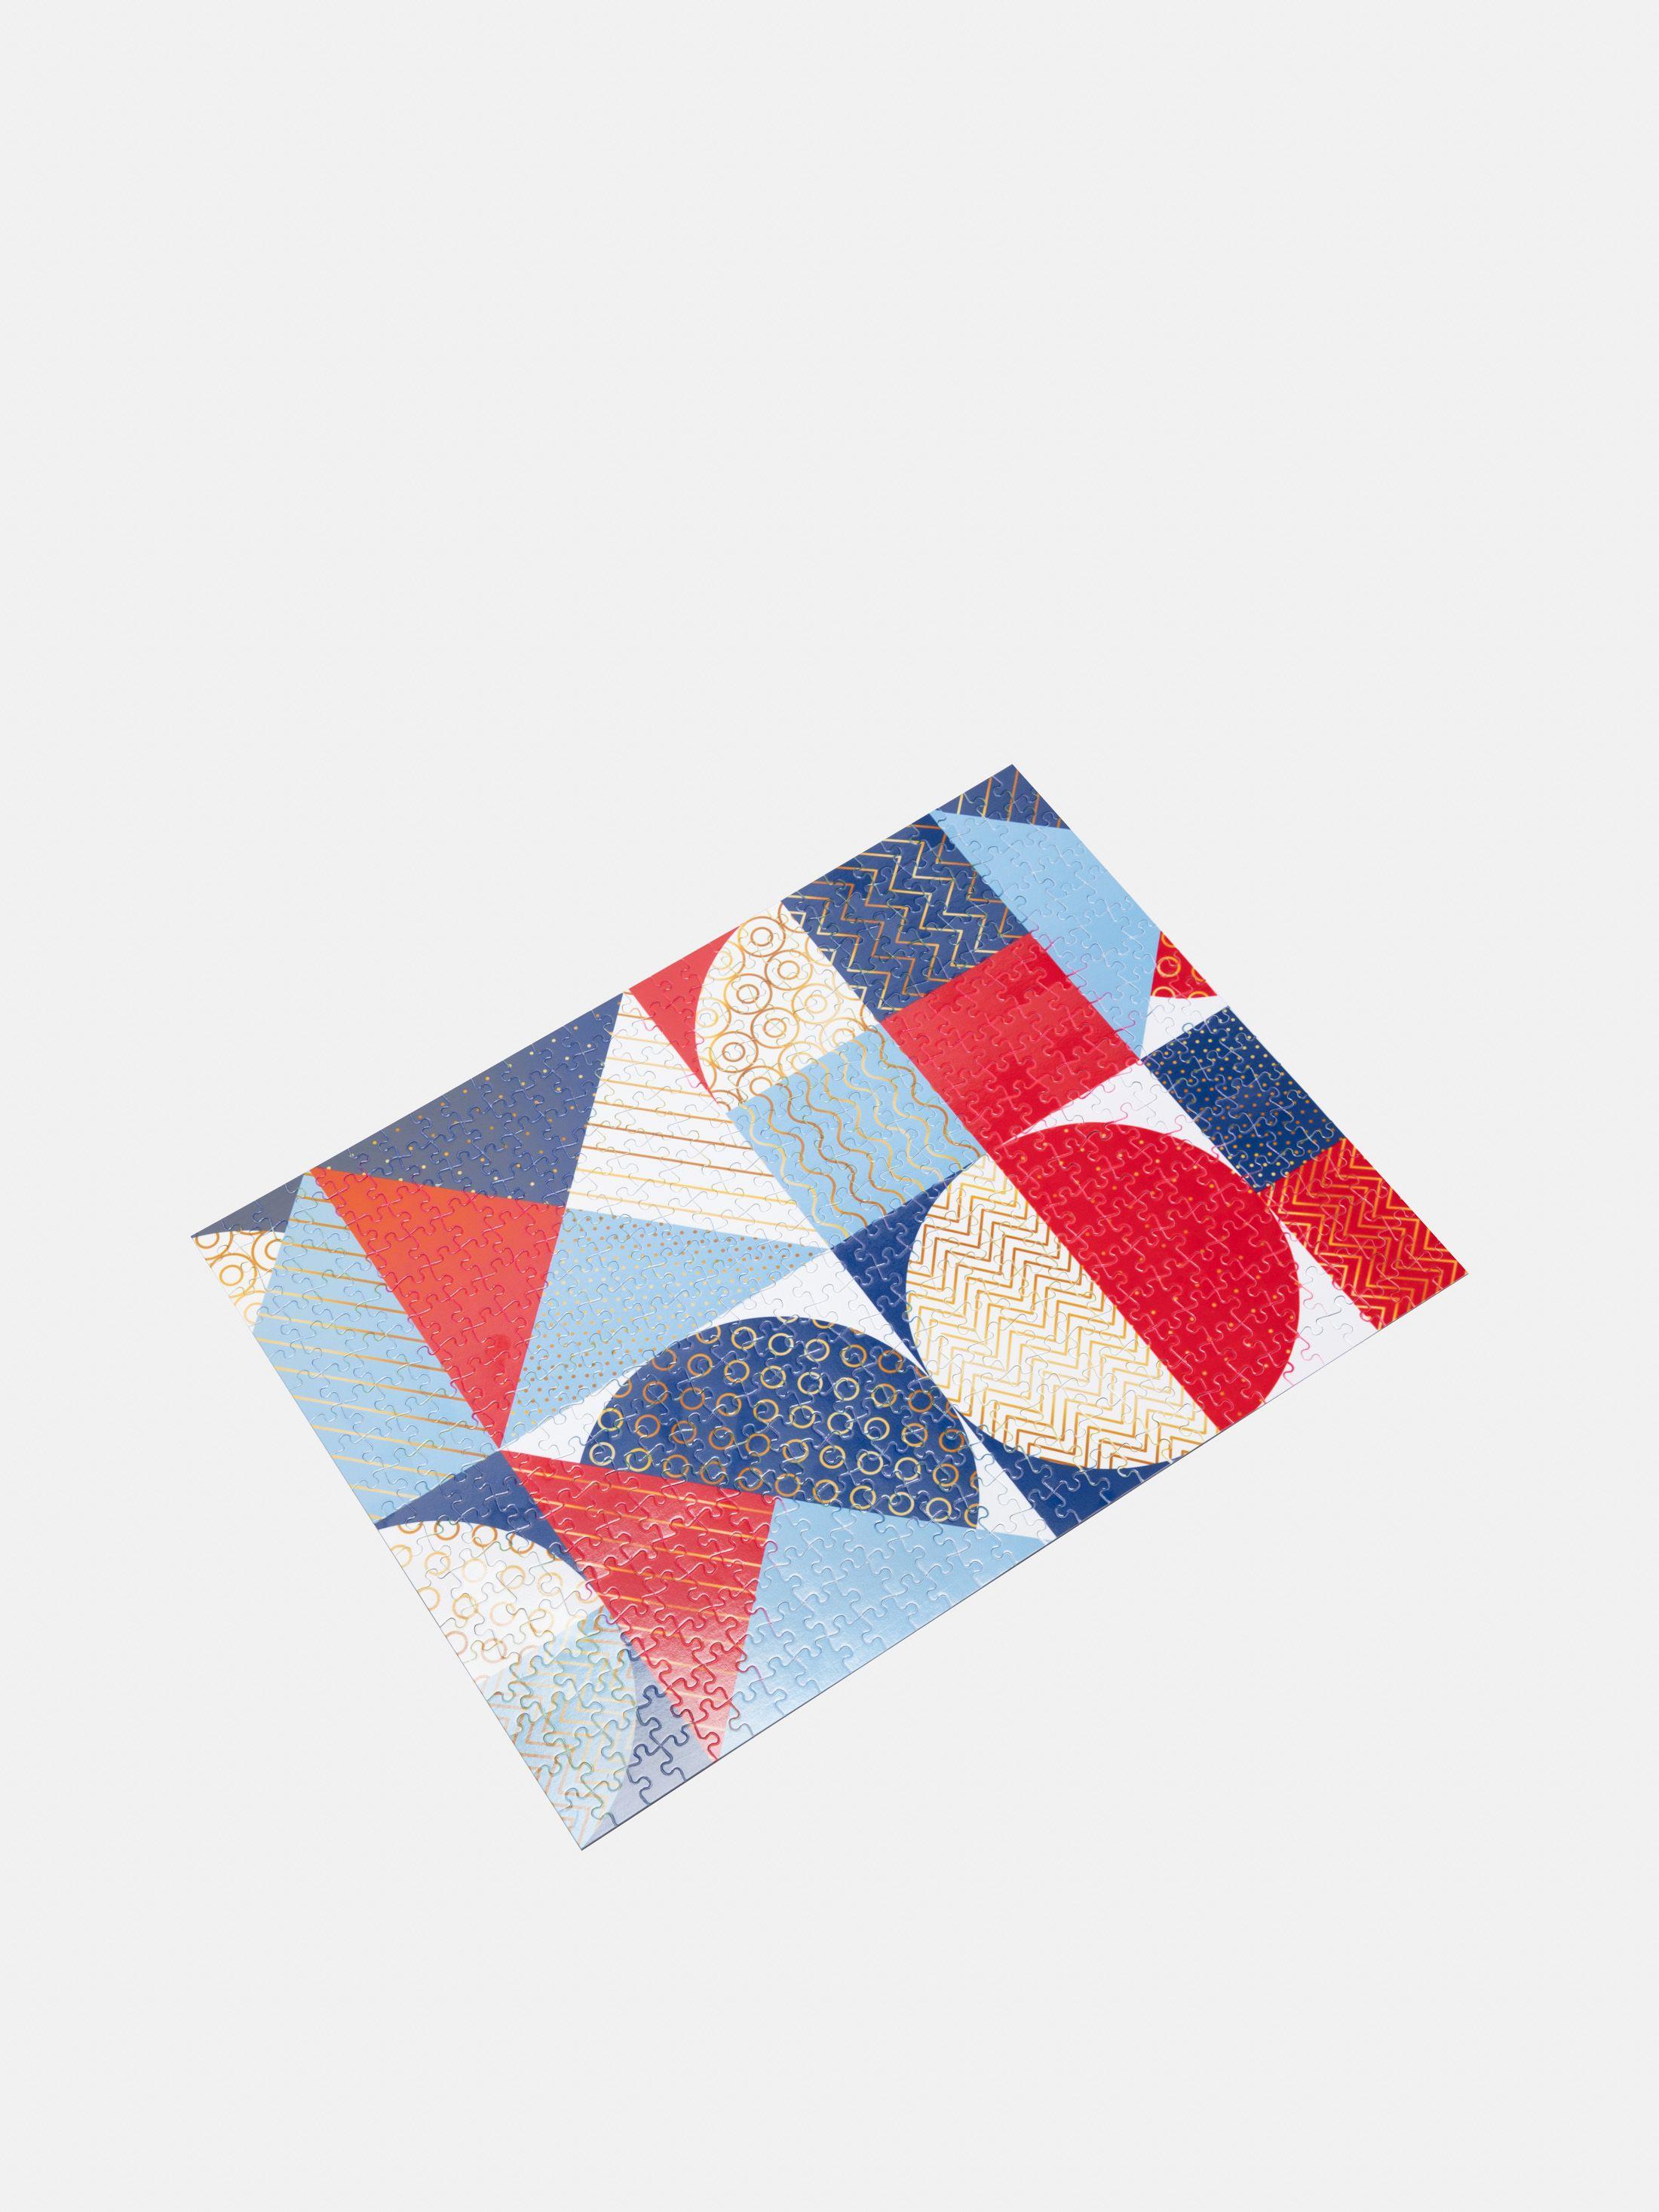 design your own 500 piece puzzle